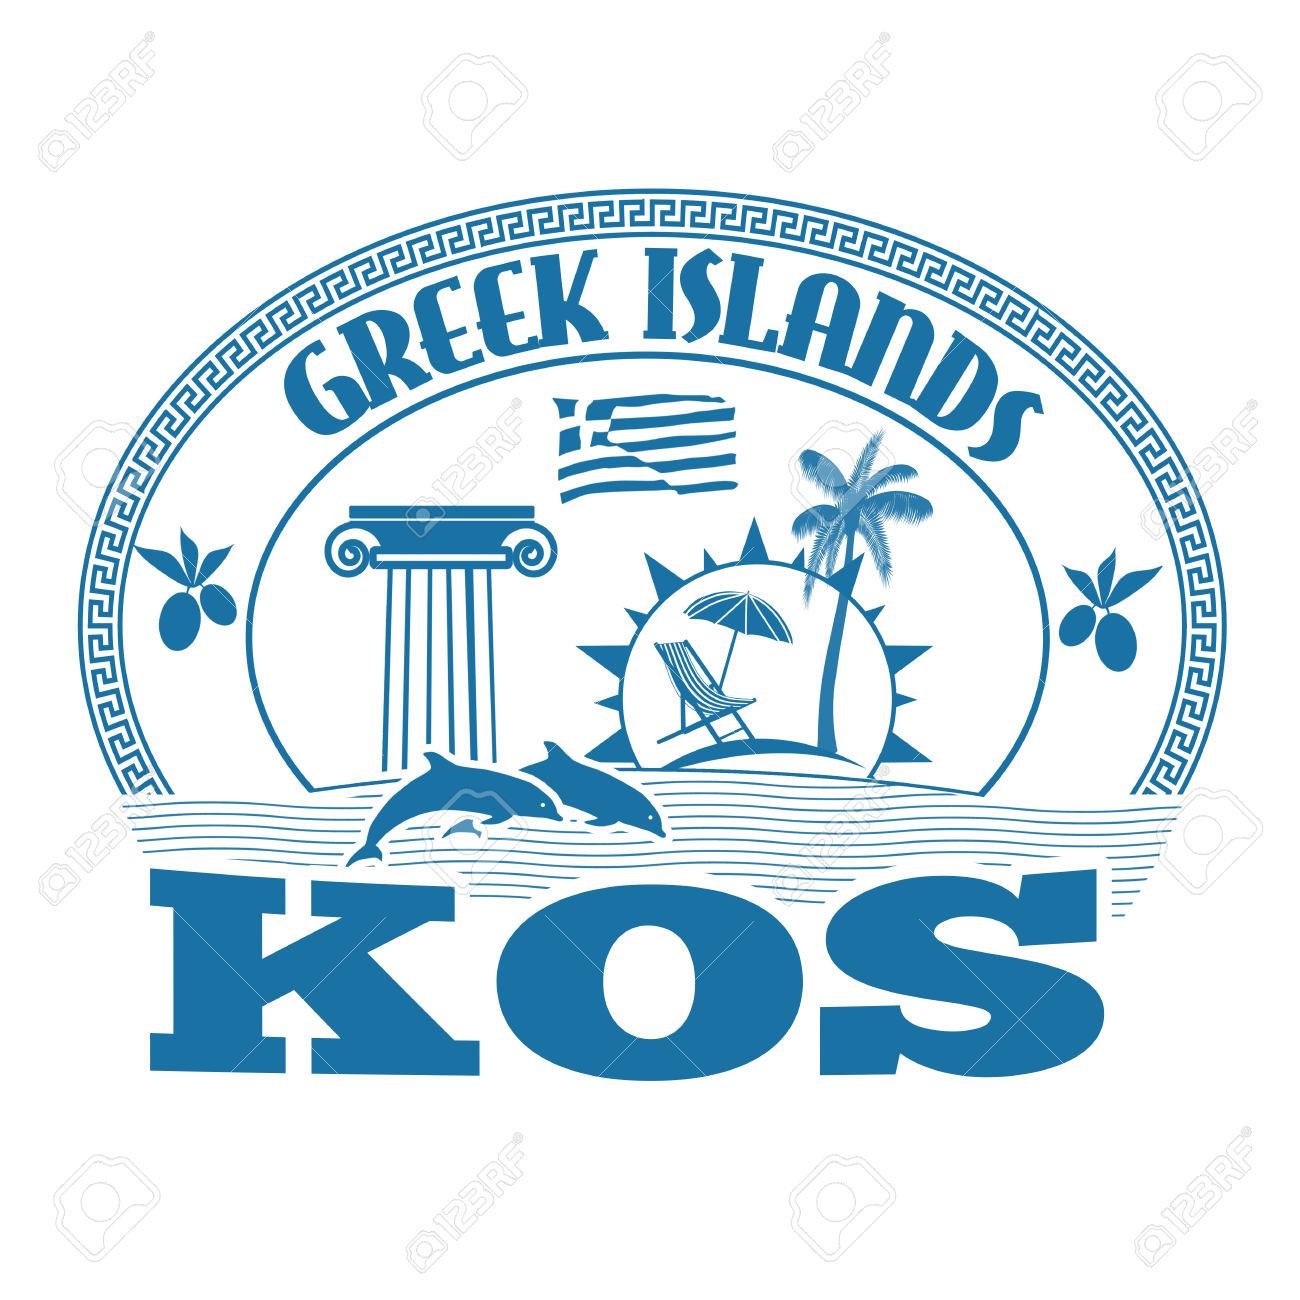 Greek Islands, Kos, Stamp Or Label On White Background, Vector.